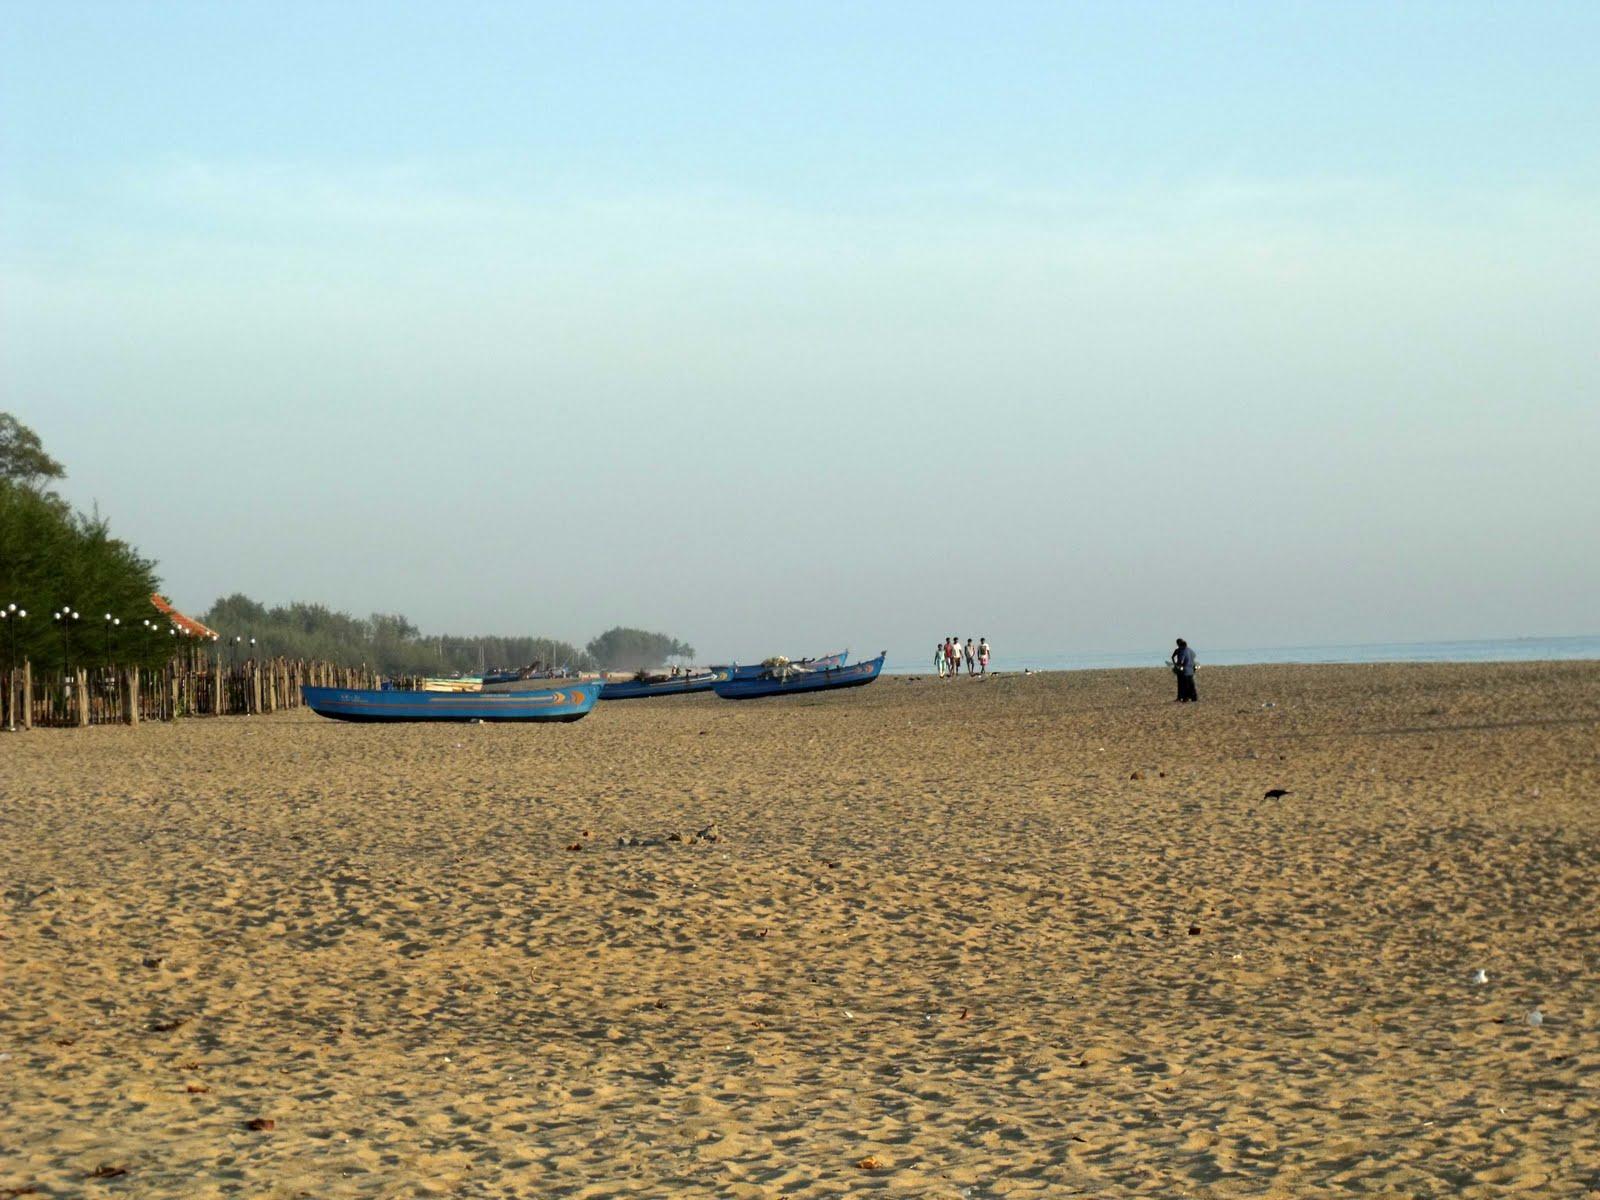 Batticaloa Sri Lanka  city pictures gallery : ... of Sri Lanka on blogspot.com: Kallady beach, Batticaloa, Sri Lanka